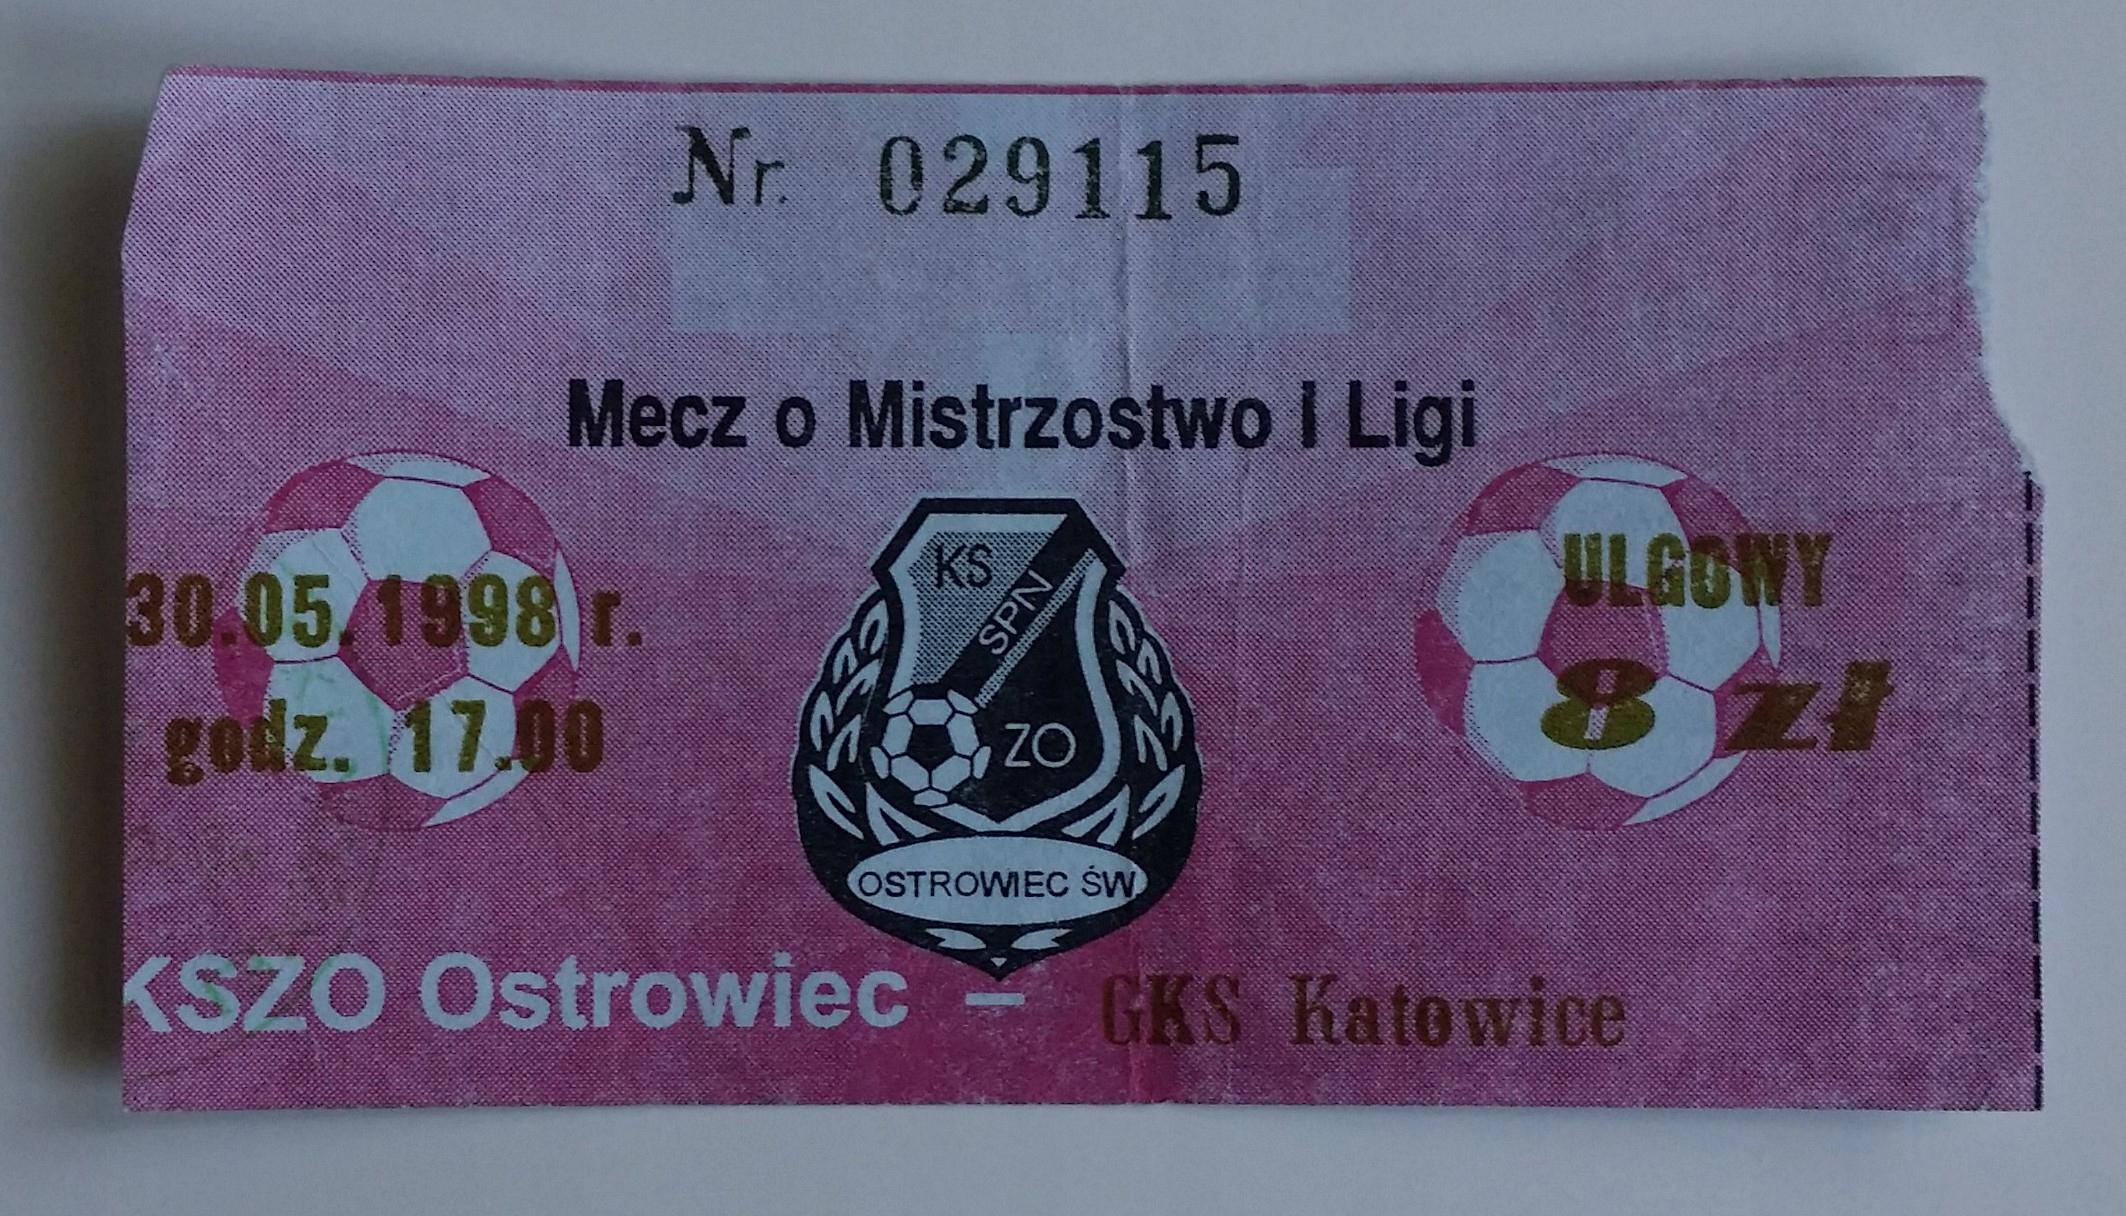 Bilet KSZO Ostrowiec - GKS Katowice 30.05.1998